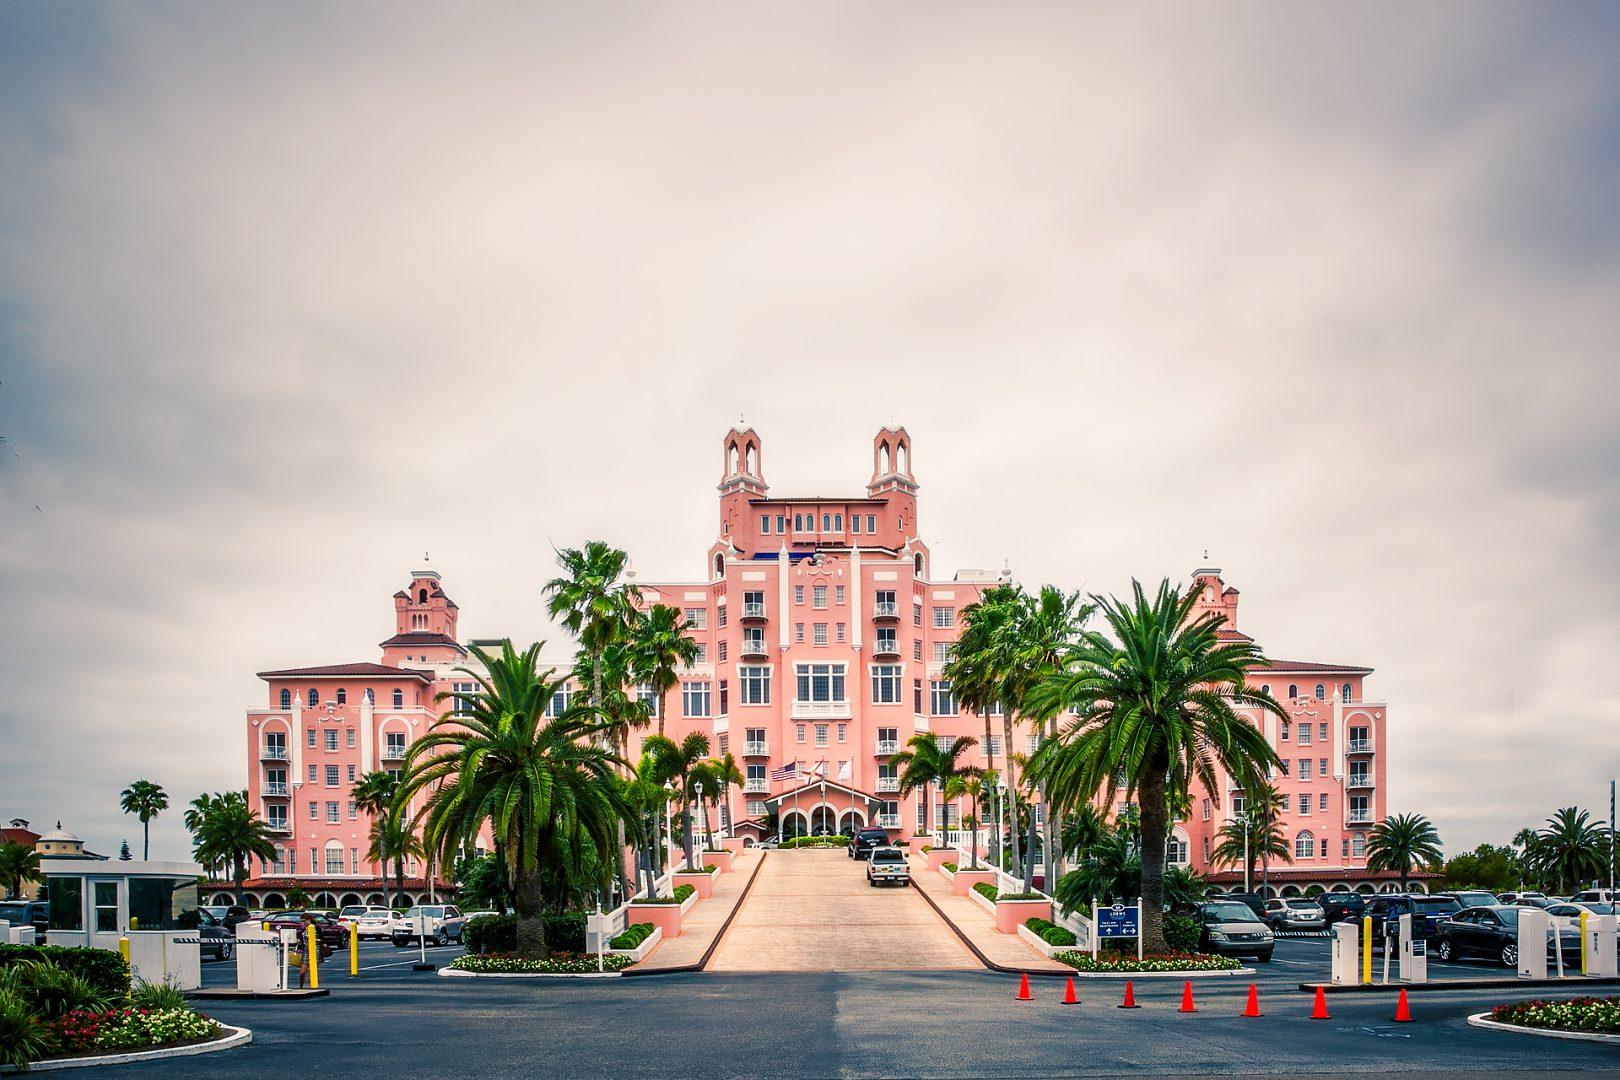 The Don Cesar, Florida